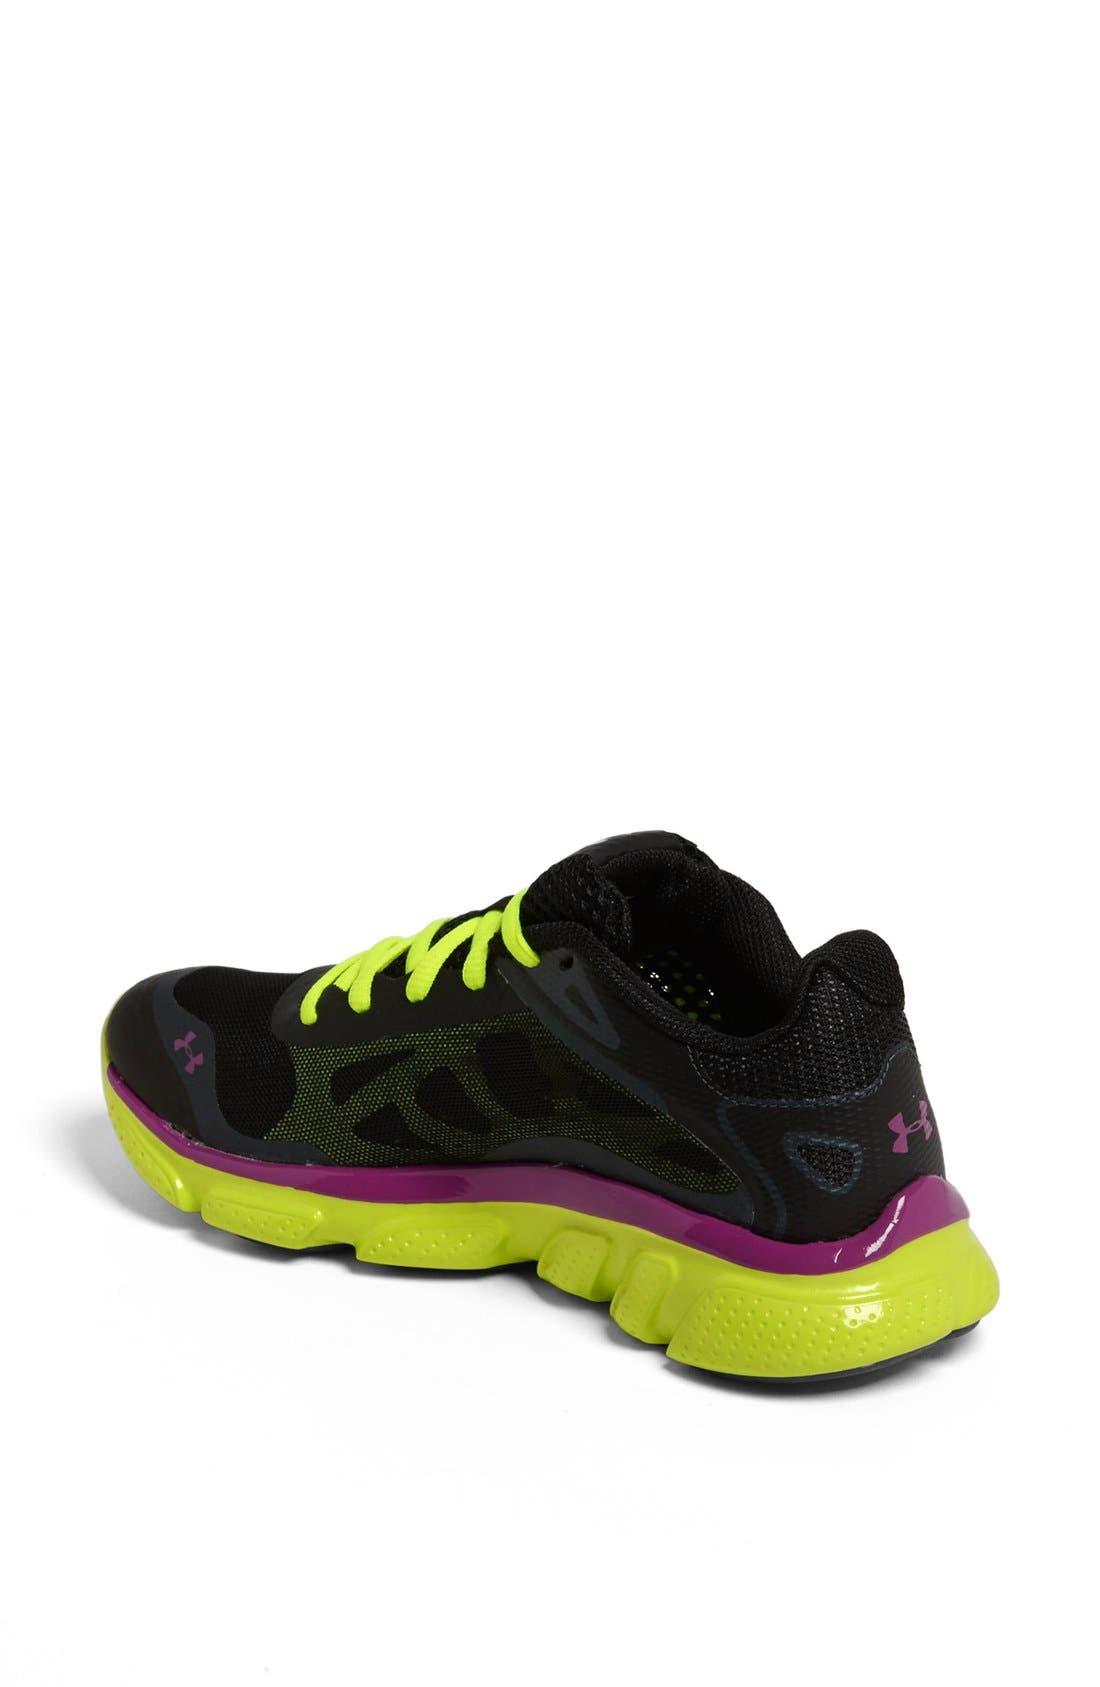 Alternate Image 2  - Under Armour 'Micro G® Pulse' Running Shoe (Women)